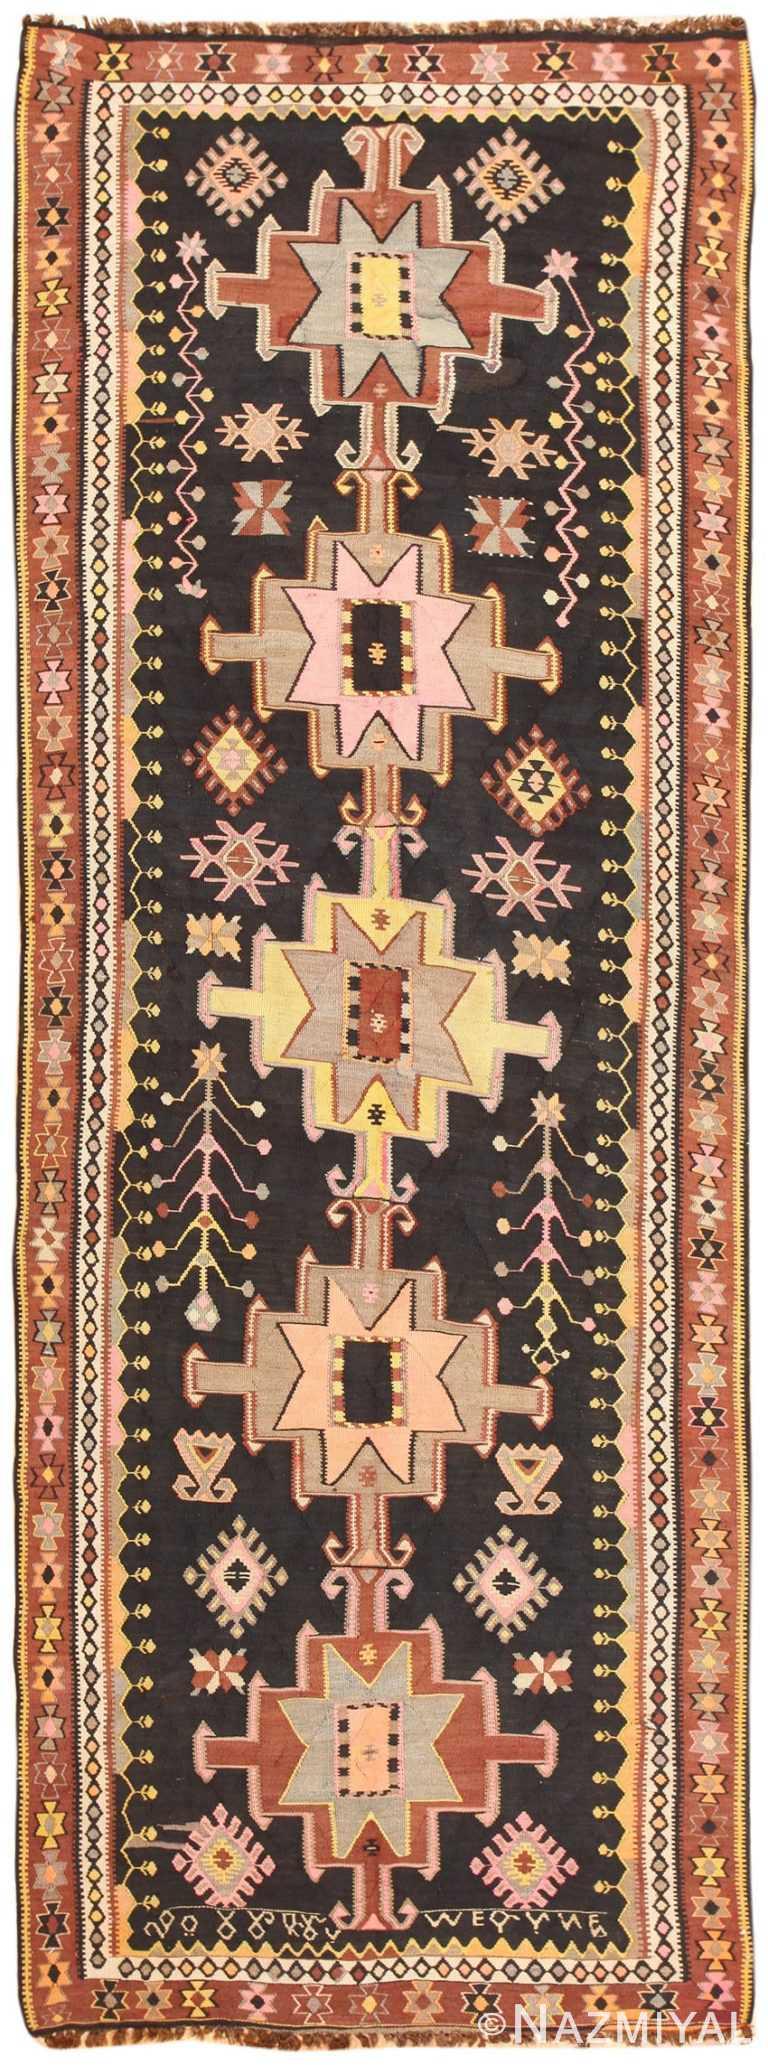 Vintage Turkish Kilim Rug 50422 Detail/Large View